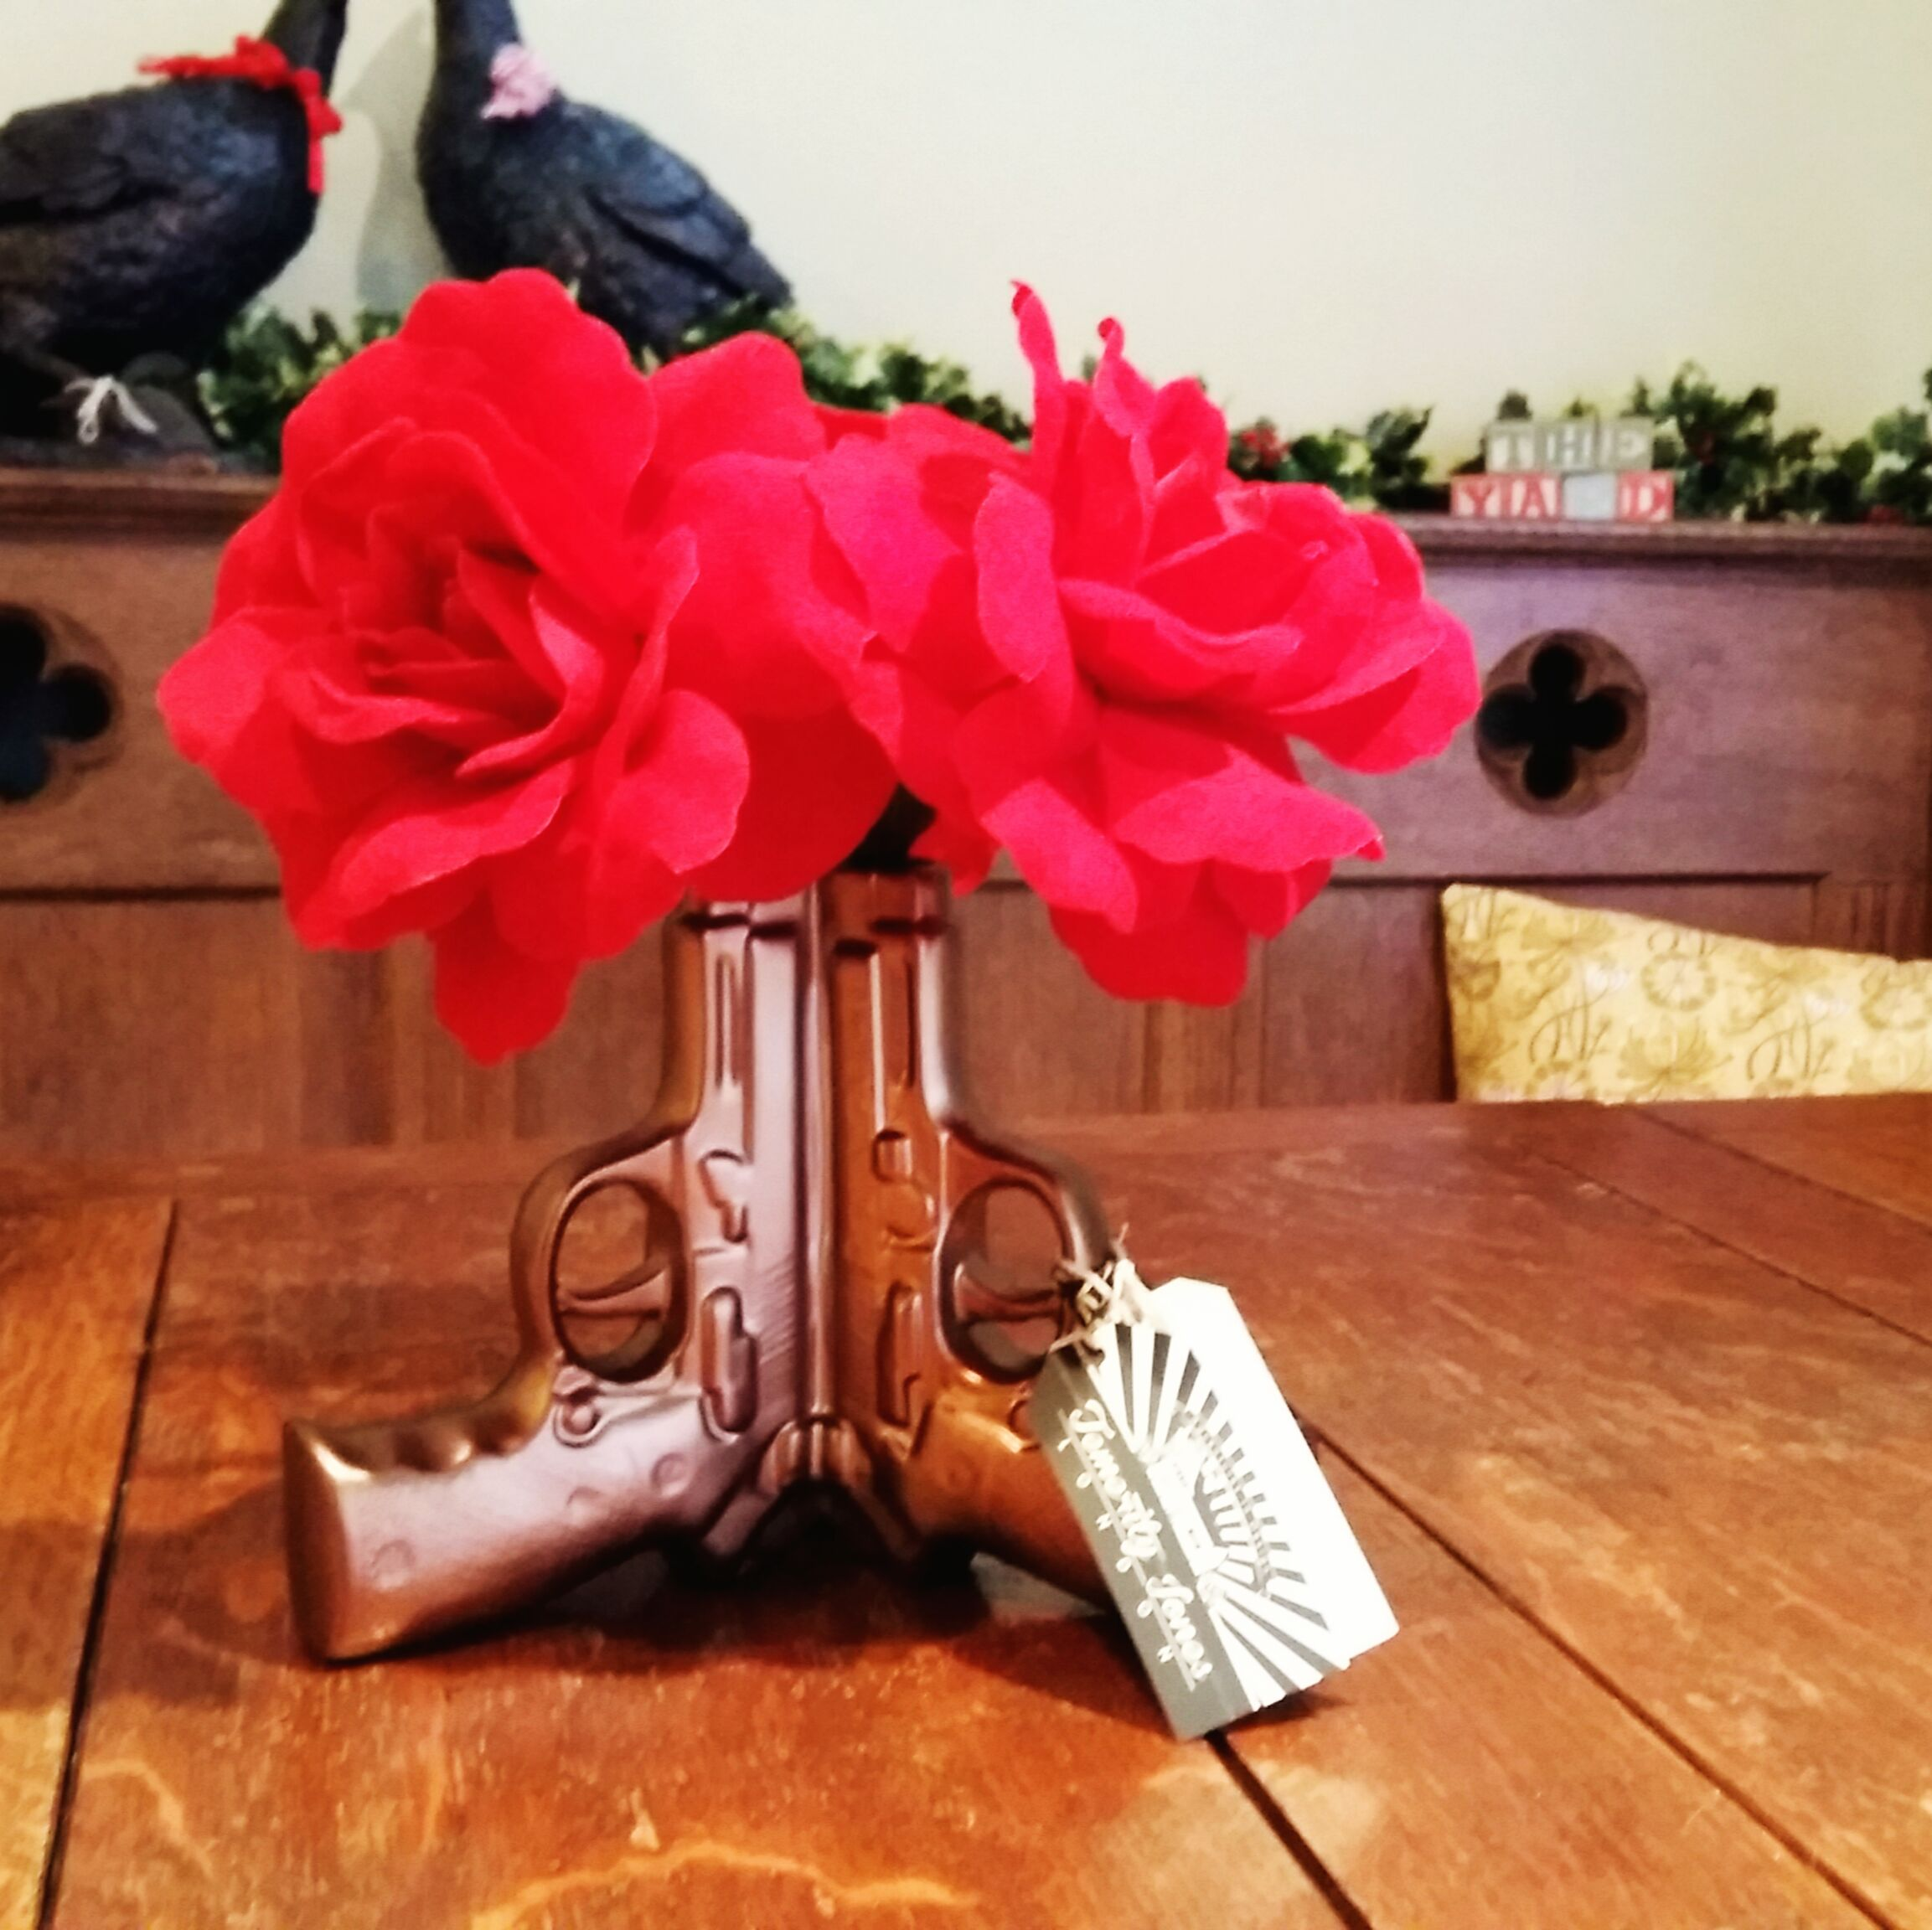 Gun vase back in stock (flowers not included)